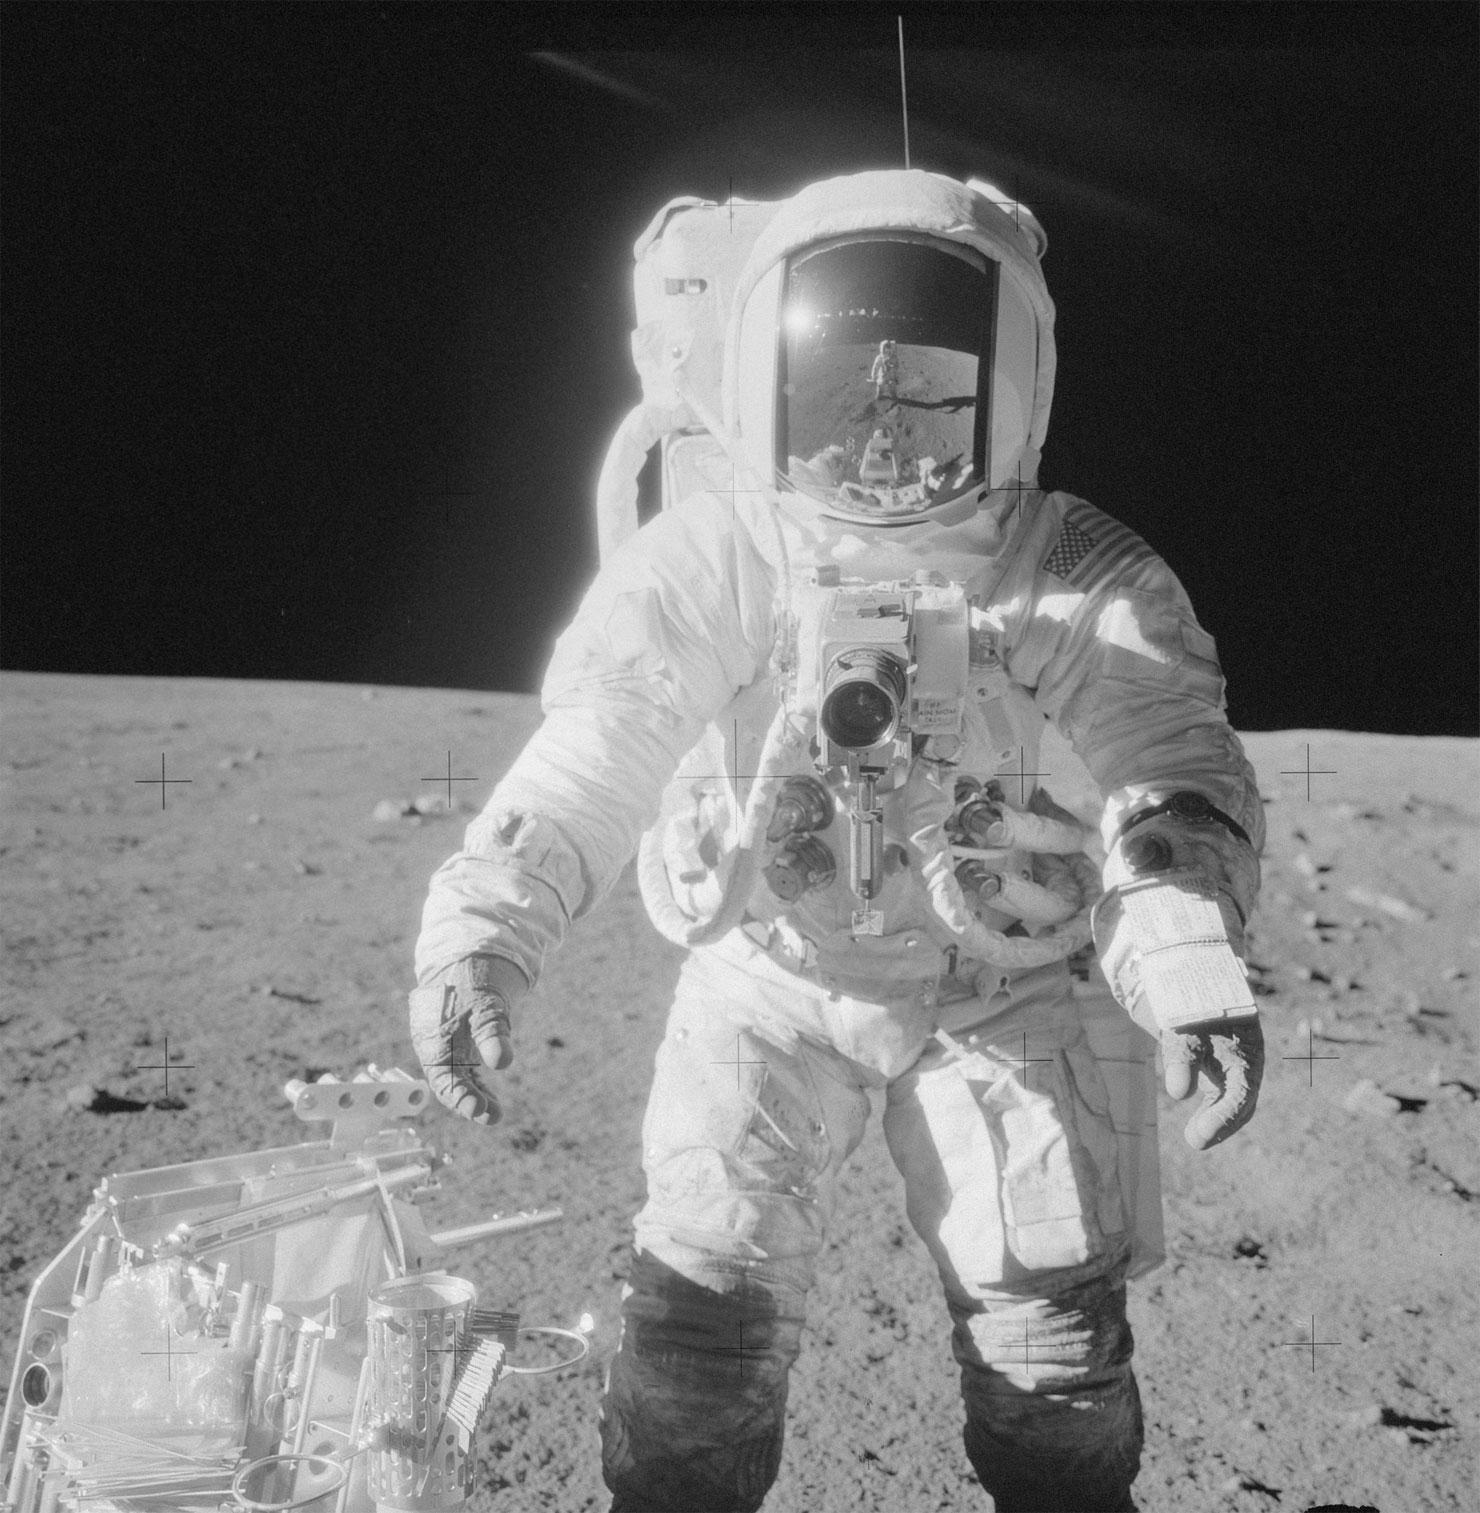 Apollon missiya foto NASA 14